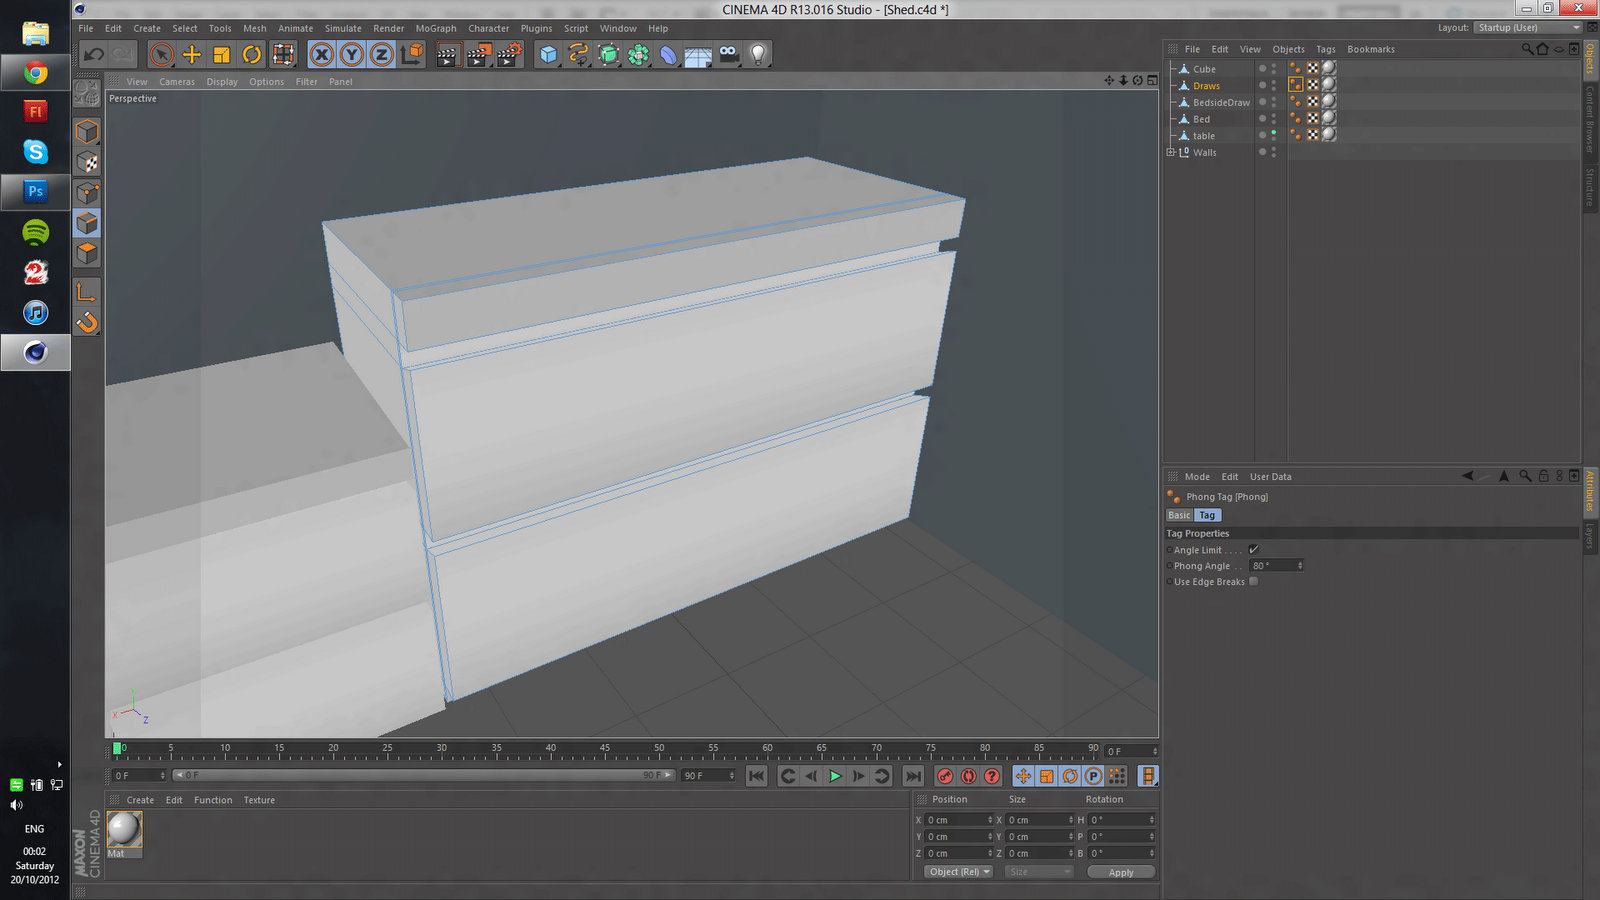 Creating my own bedroom in Cinema 4D | 3D modelling